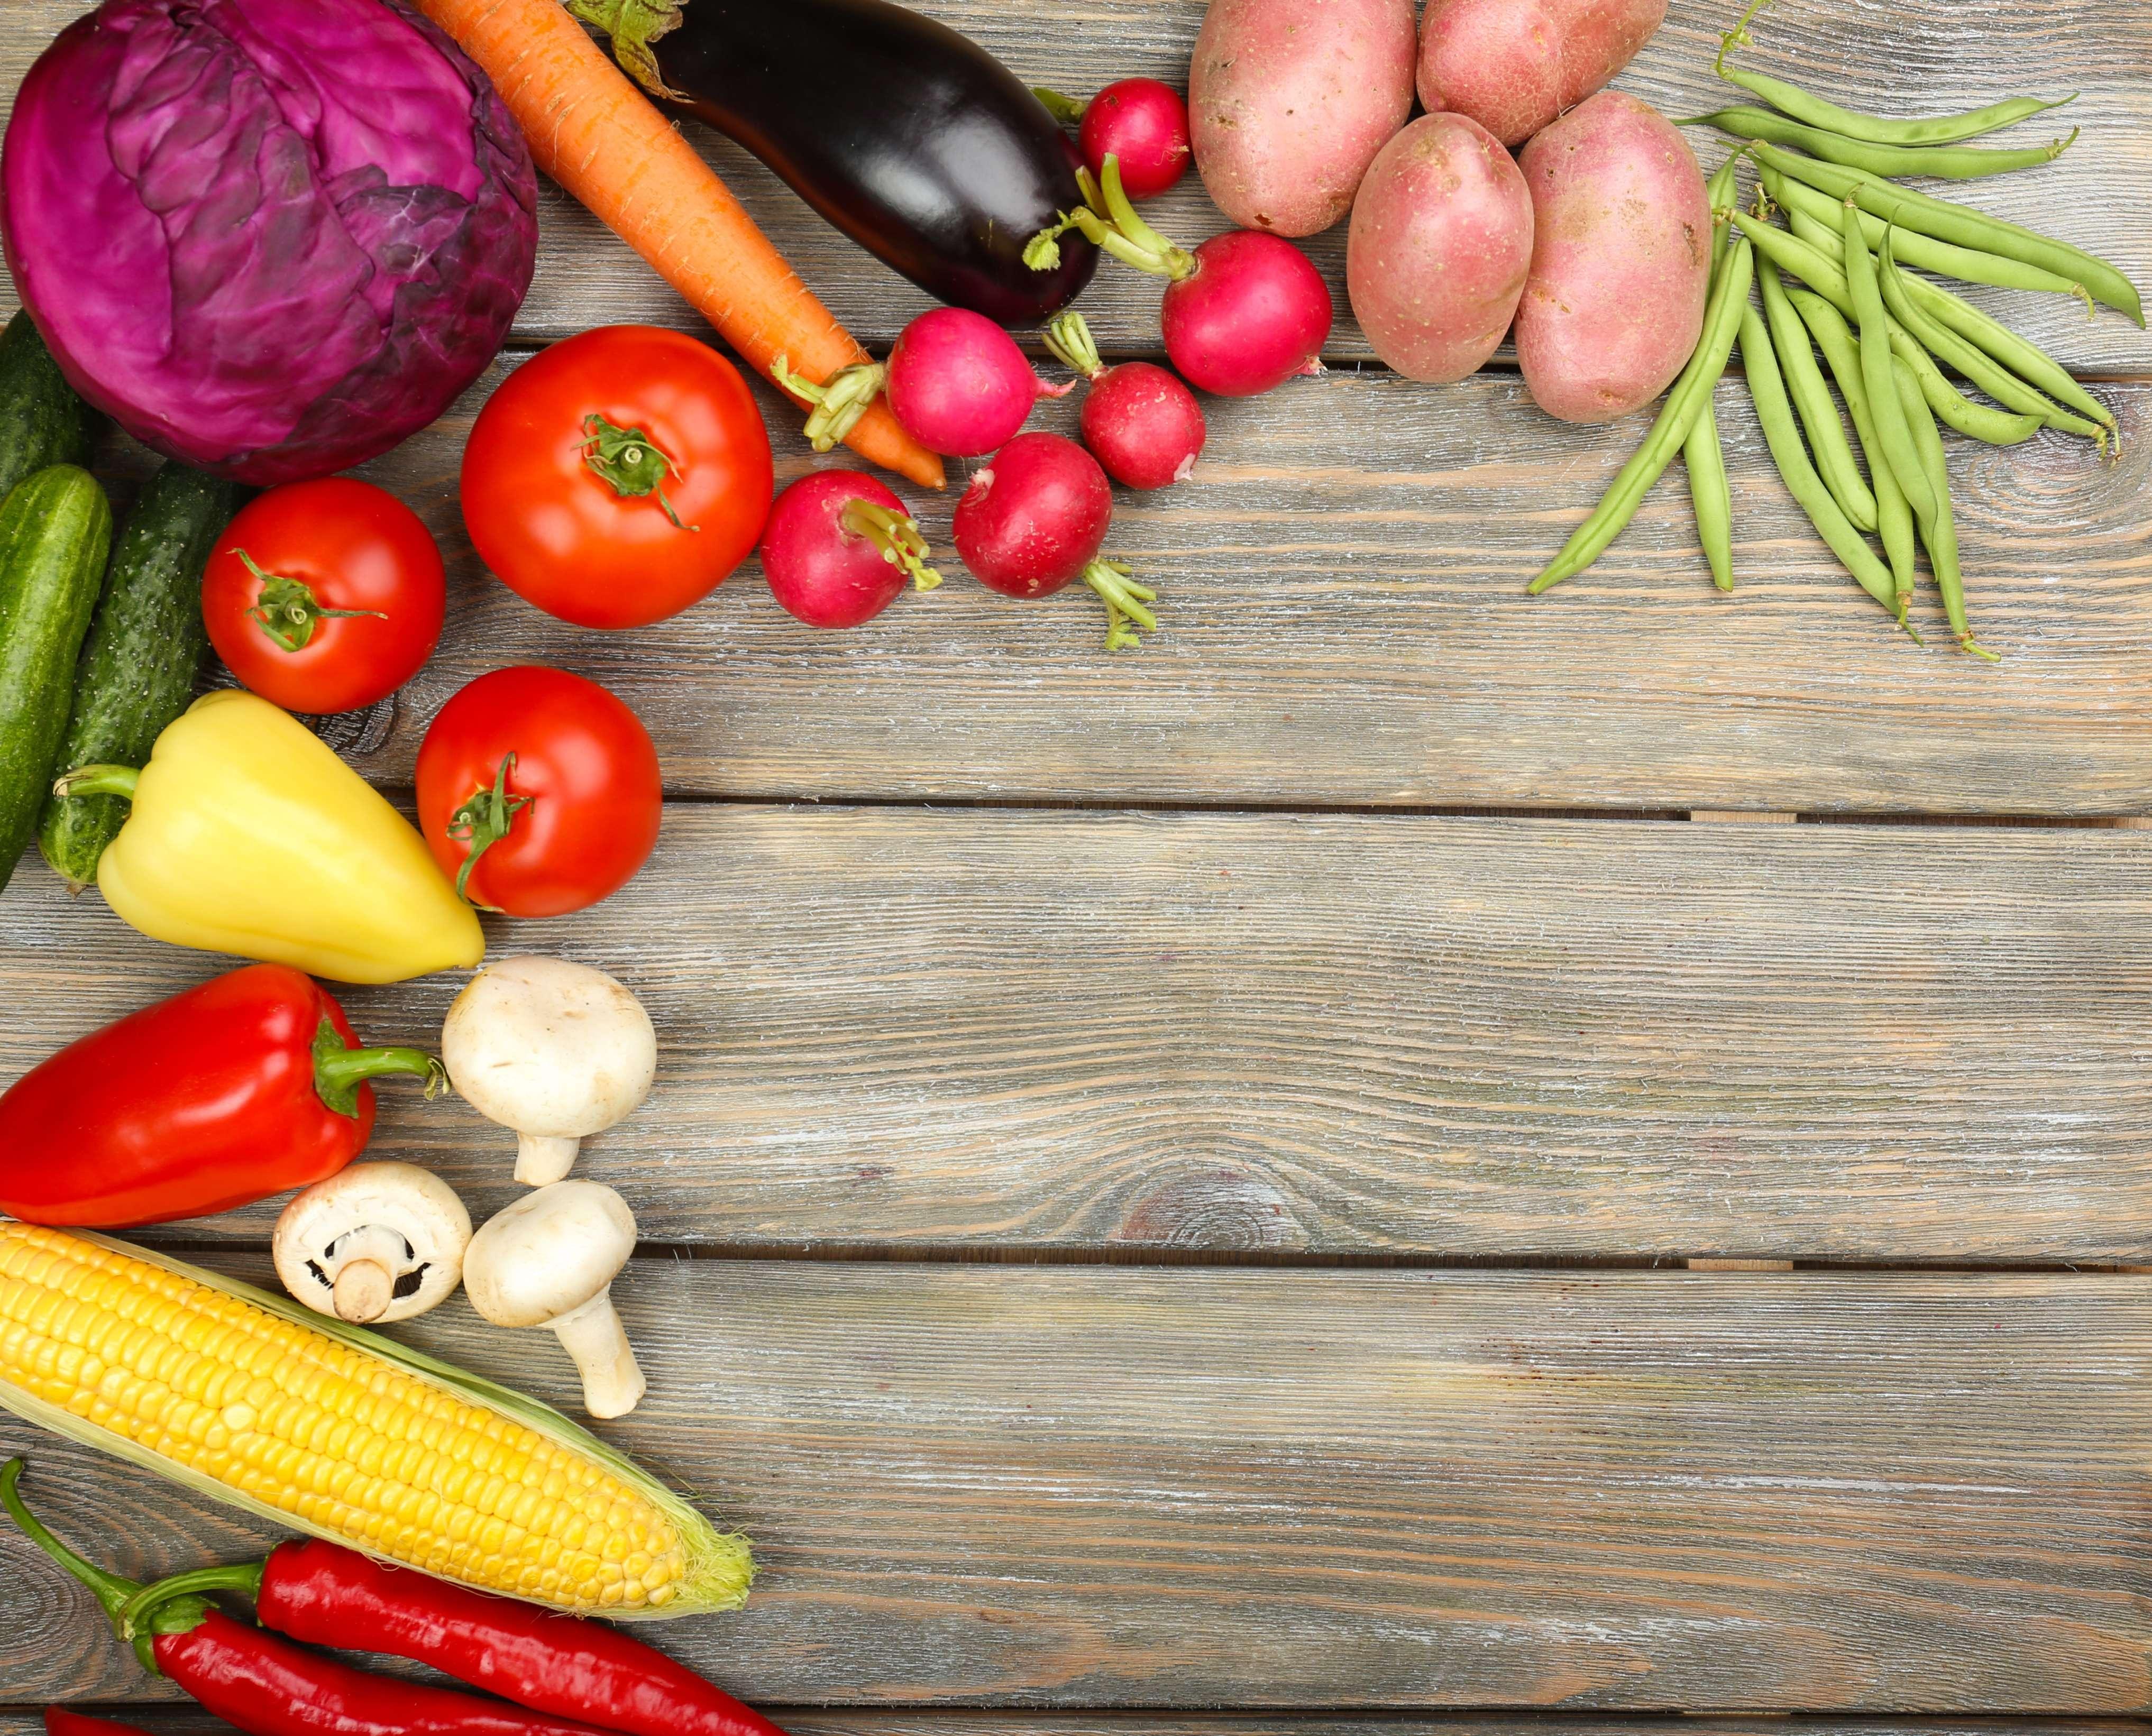 cucina sana corsi di cucina vegan naturale scuola di cucina vegan corso professionale cucina vegan